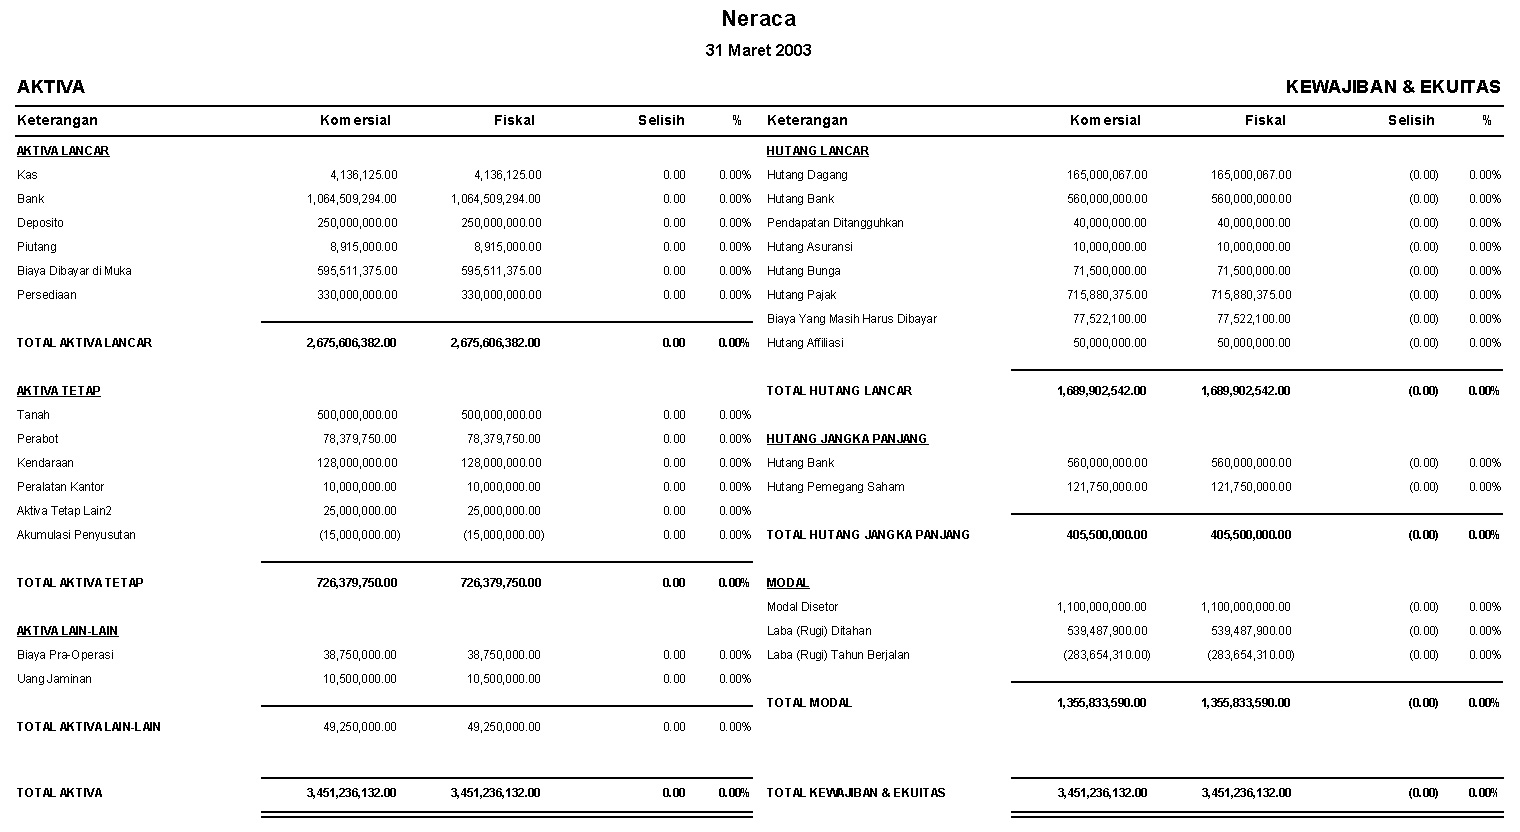 Contoh Laporan Neraca Komparatif Komersial/Fiskal